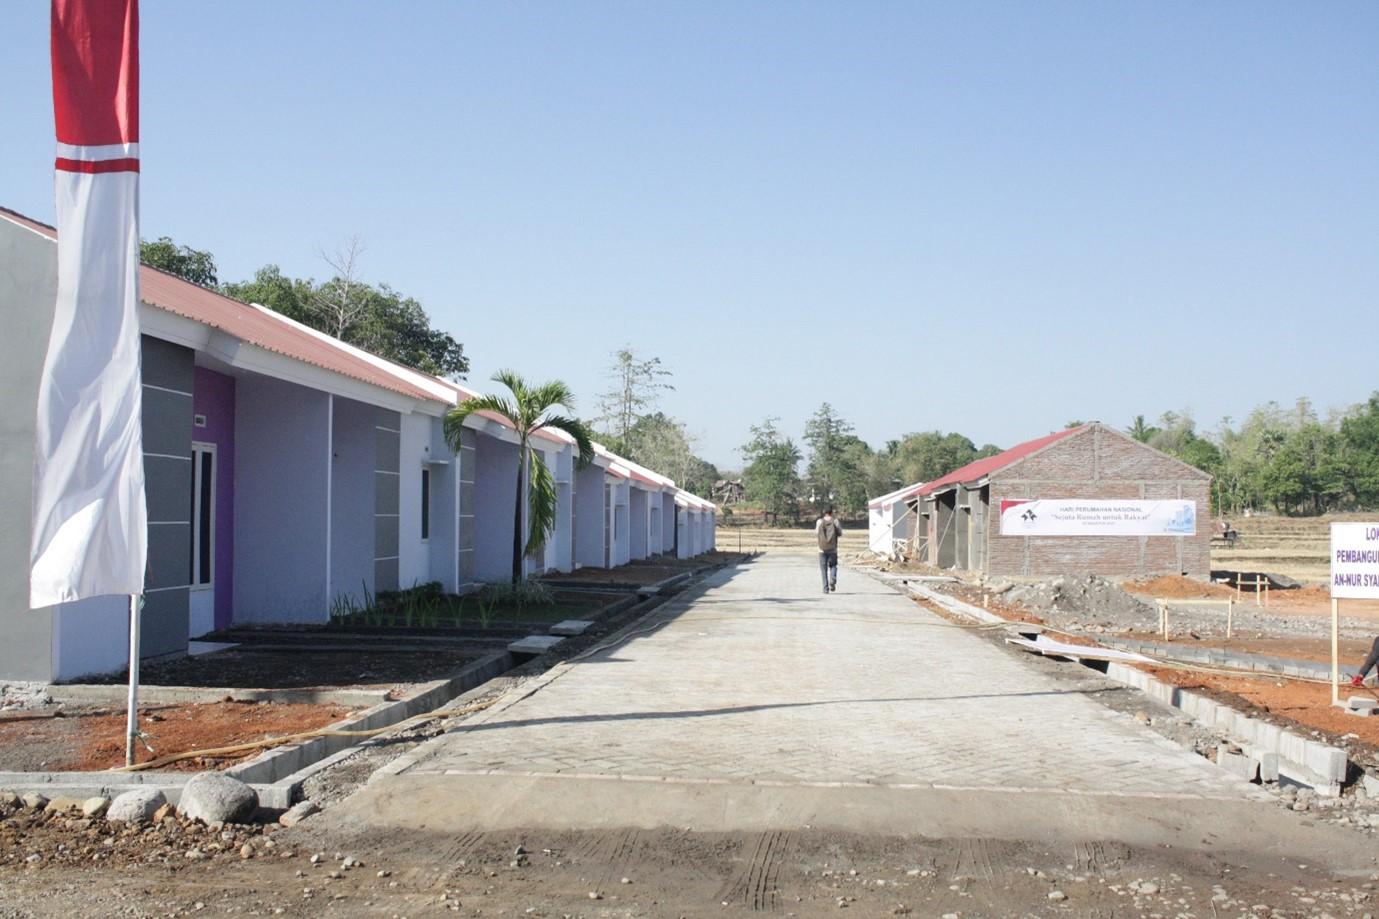 Asosiasi Pengembang Nyatakan Komitmen Bangun Rumah Subsidi Berkualitas